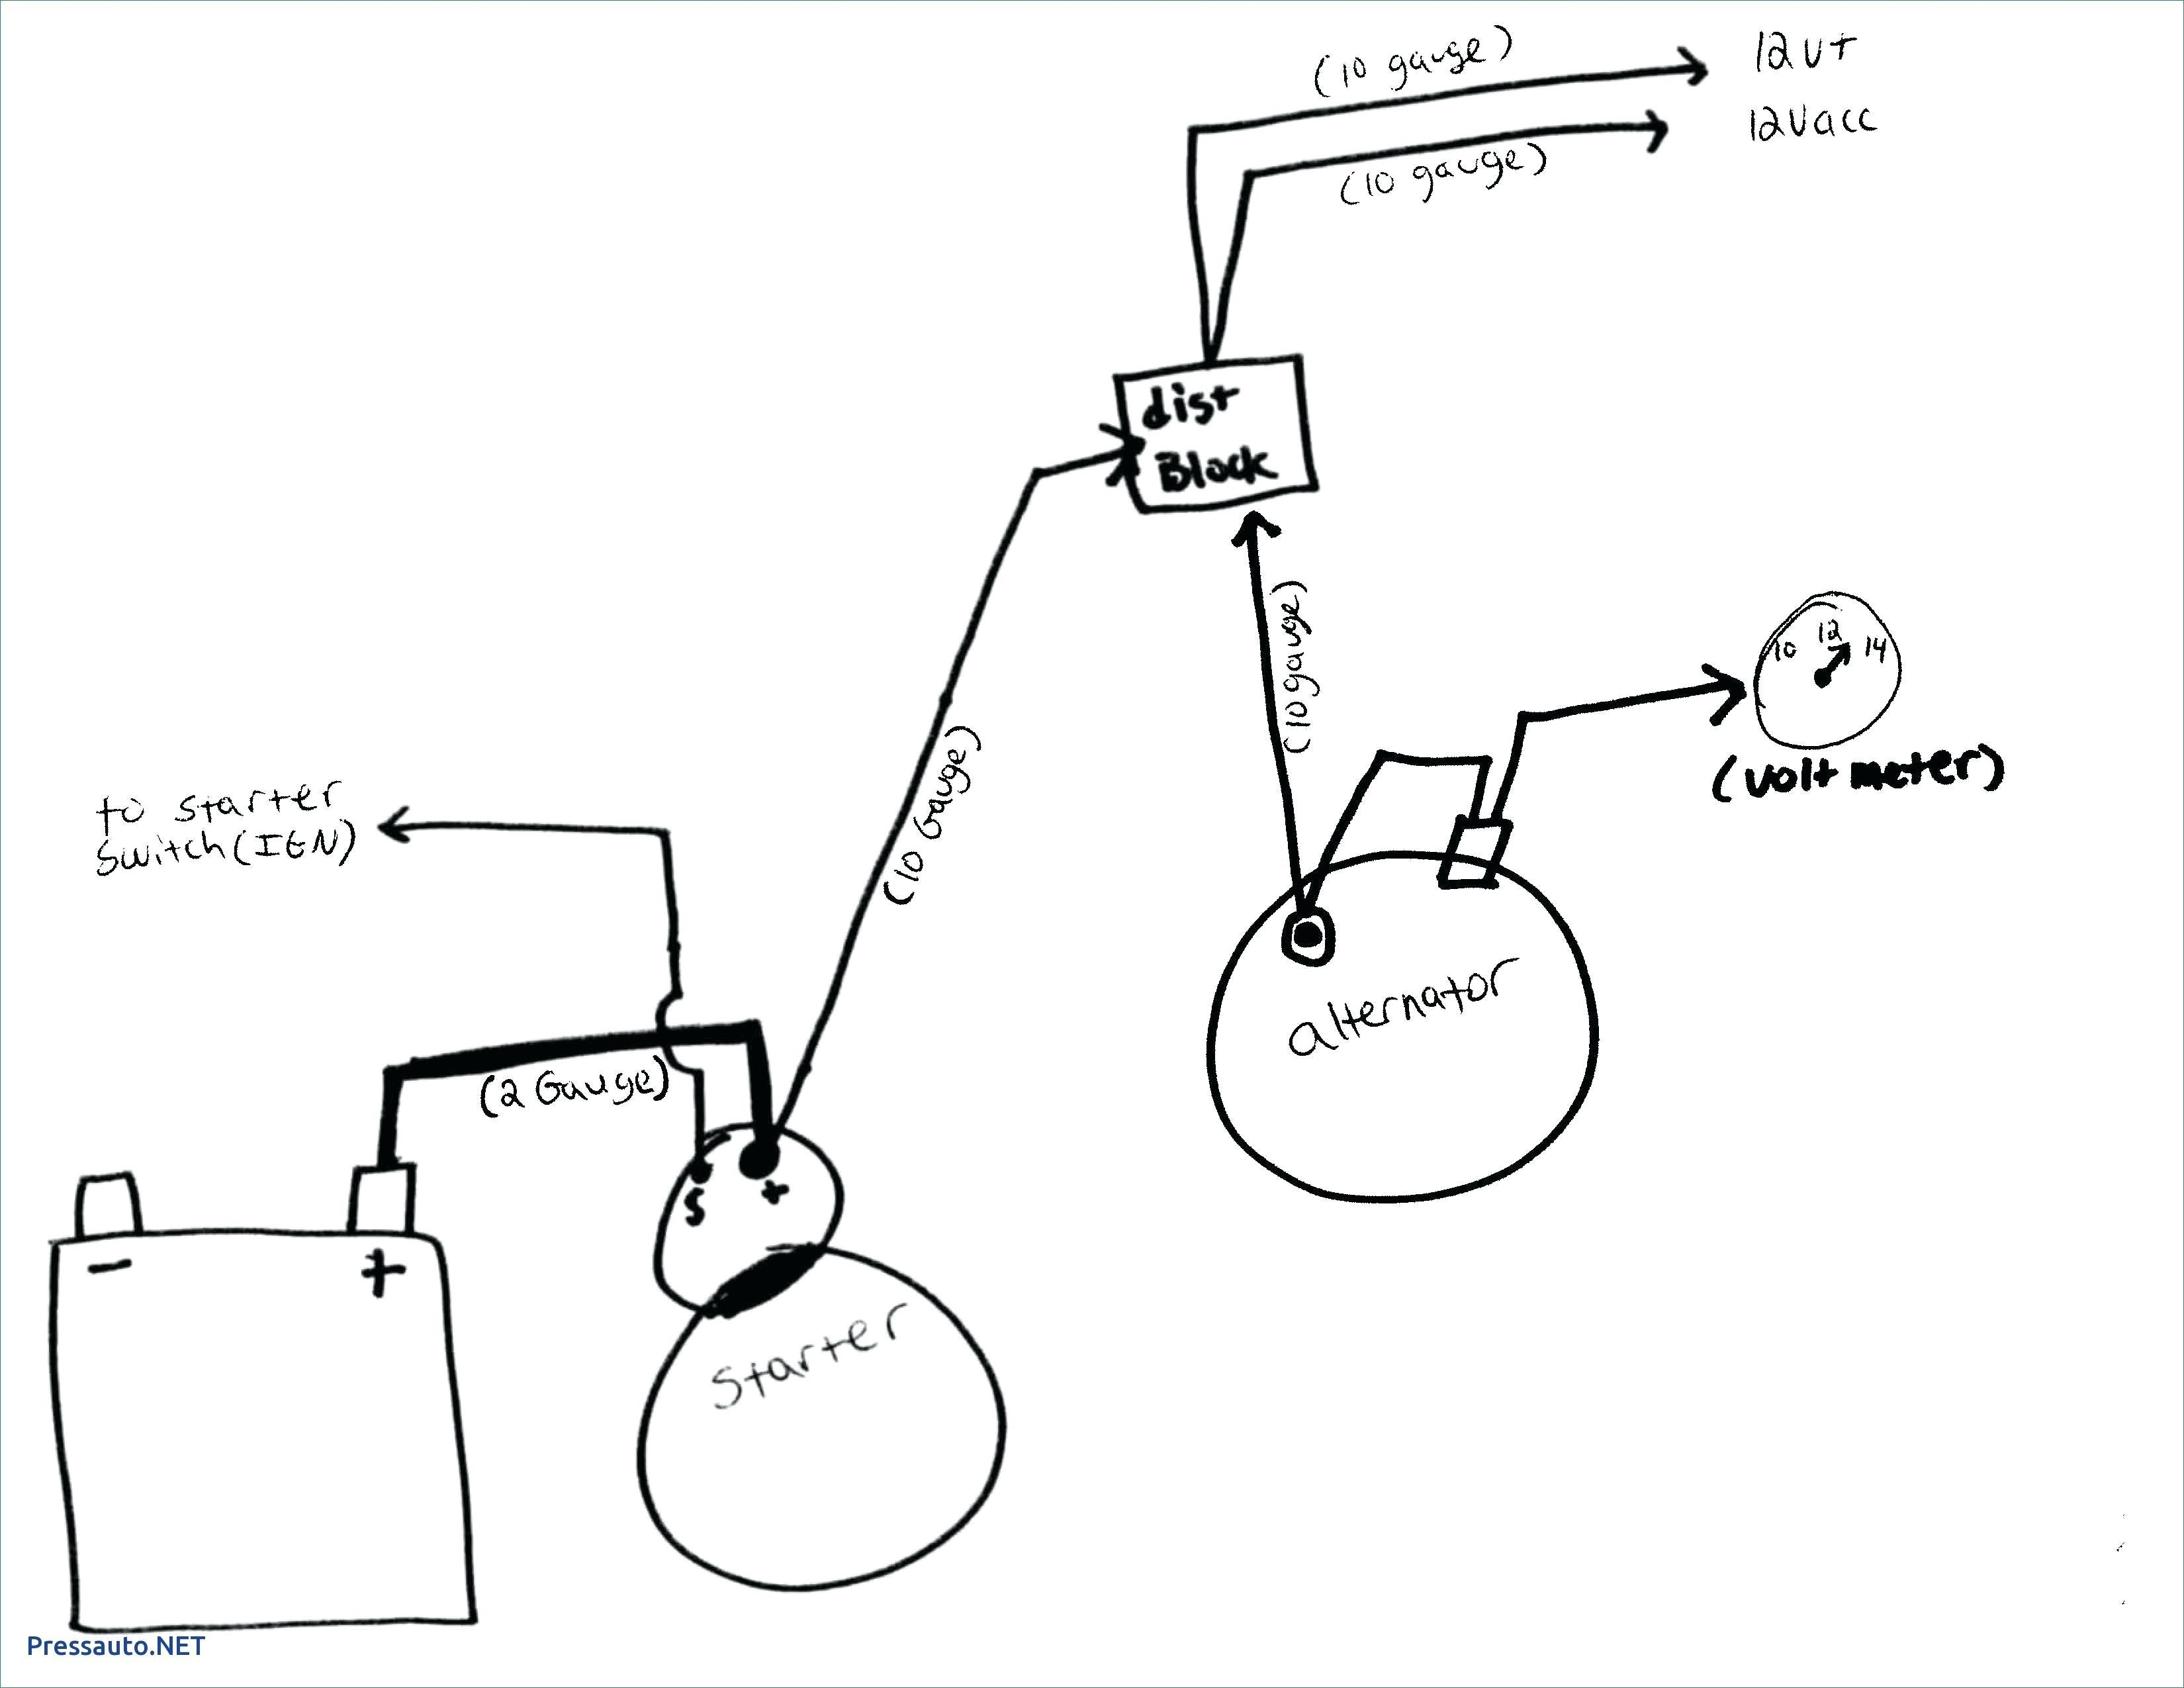 nx_7107] 2wire chevy alternator wiring diagram also 2wire ... 1970 chevy alternator wiring diagram one wire alternator conversion cali sapebe mohammedshrine librar wiring 101